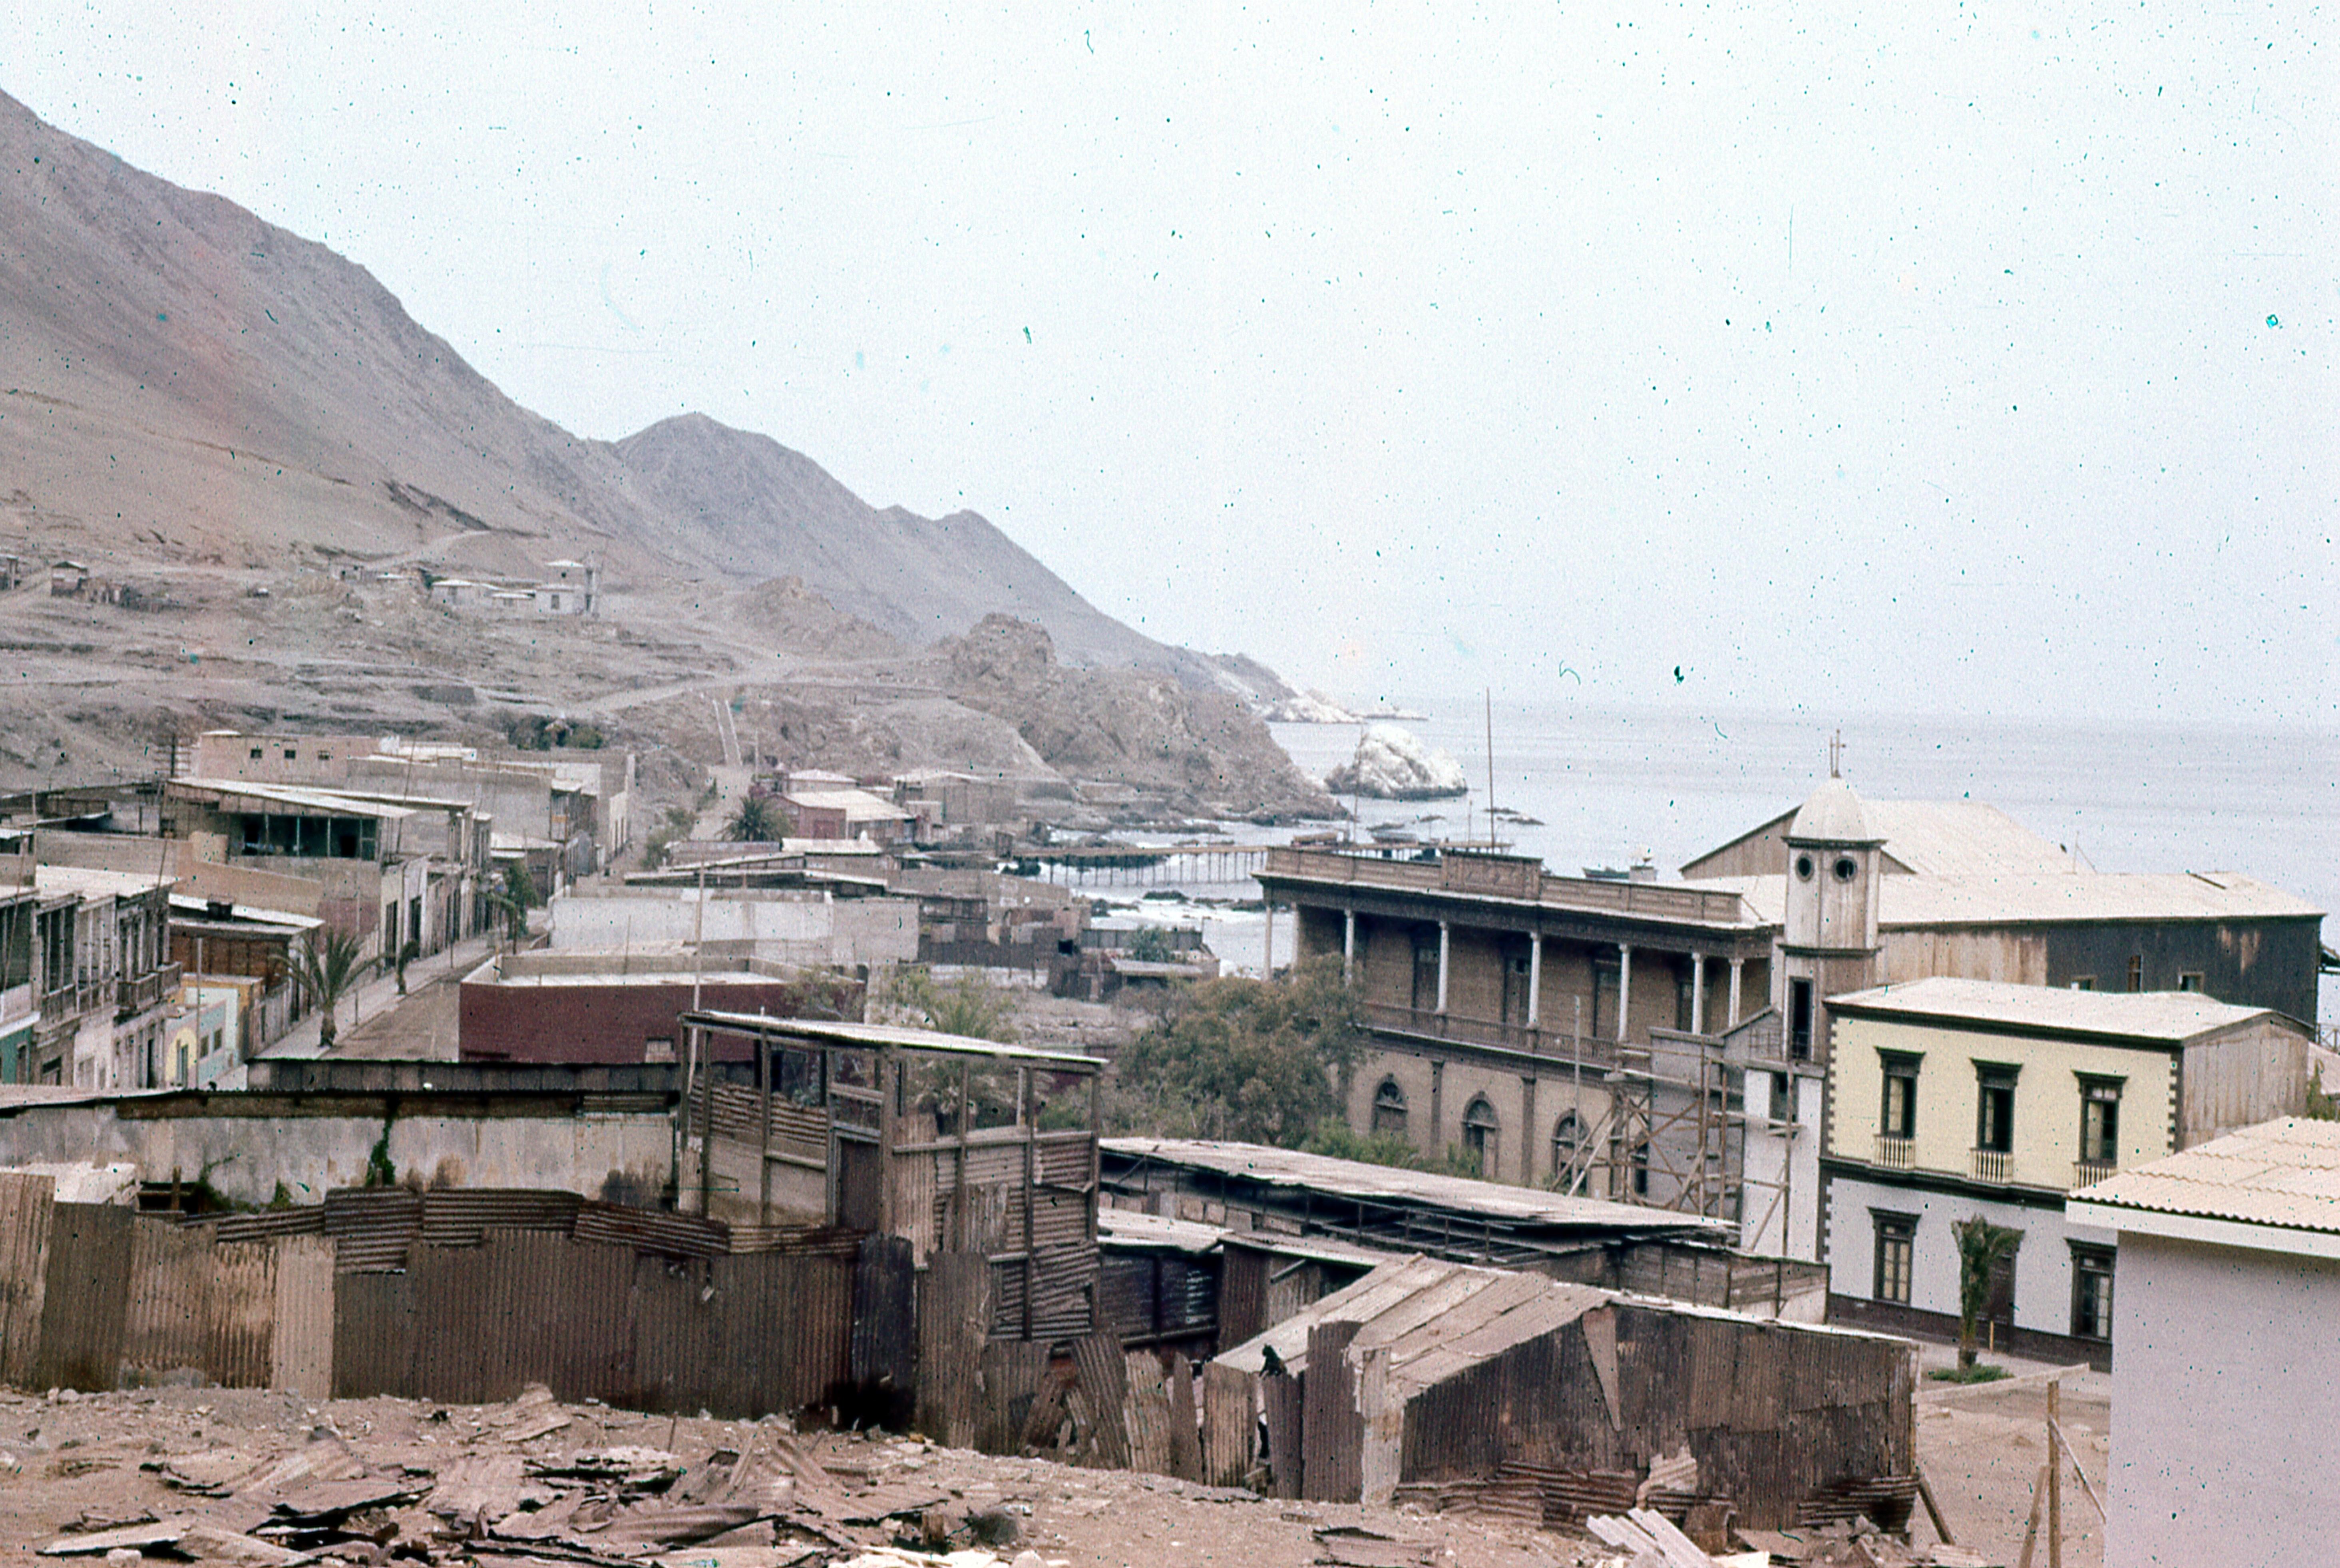 Enterreno - Fotos históricas de chile - fotos antiguas de Chile - Pisagua, 1977